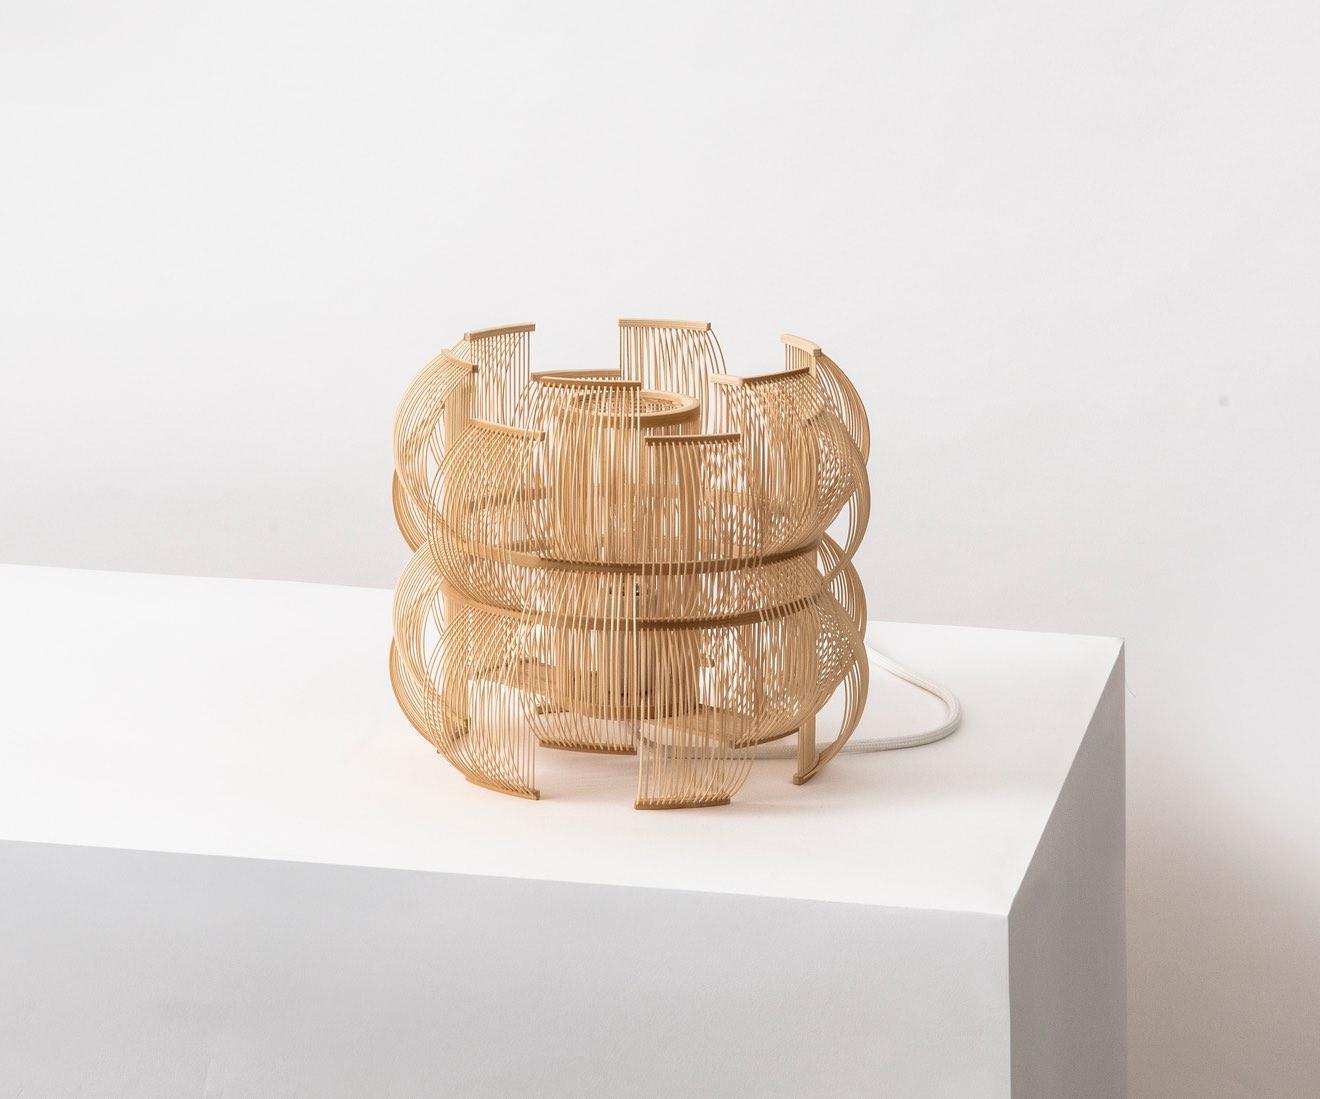 Motarasu Product Sen table lamp by Tani Toshiyuki